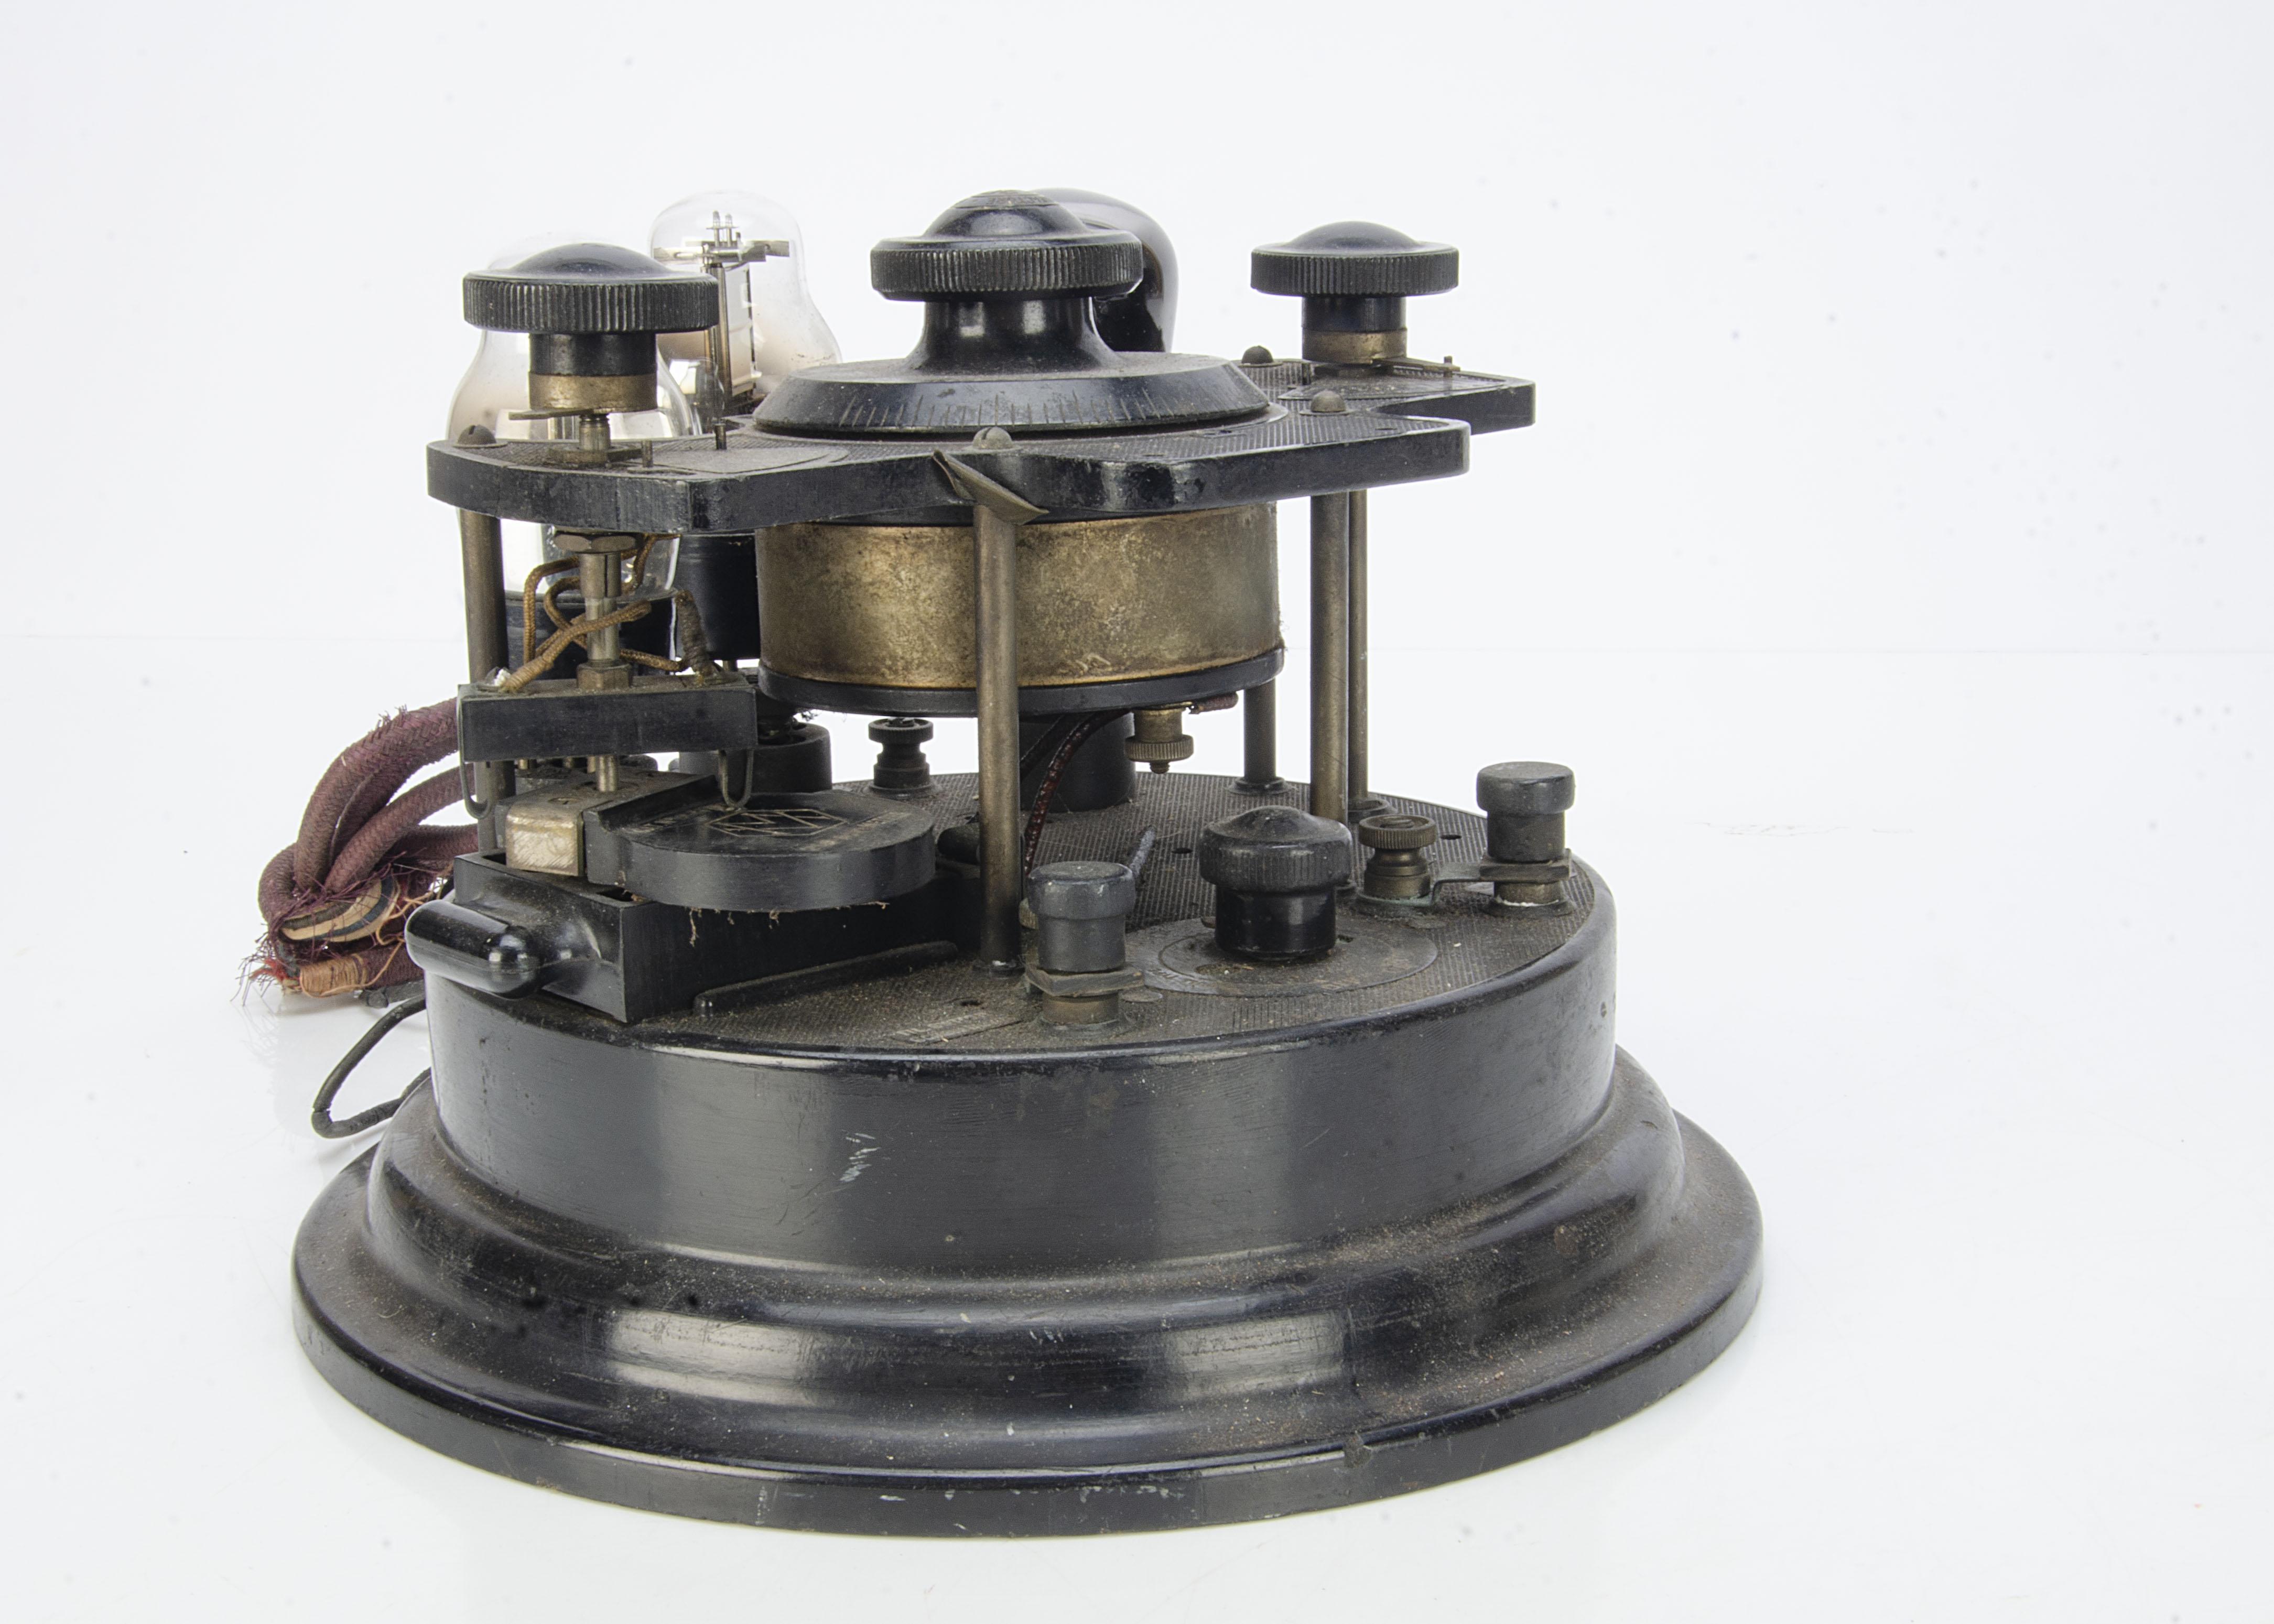 Cosmos Radiophone VR4, a Cosmos Radiophone VR4 'Cruet Set' 3 valve wireless receiver CAT No:89591 - Image 2 of 3